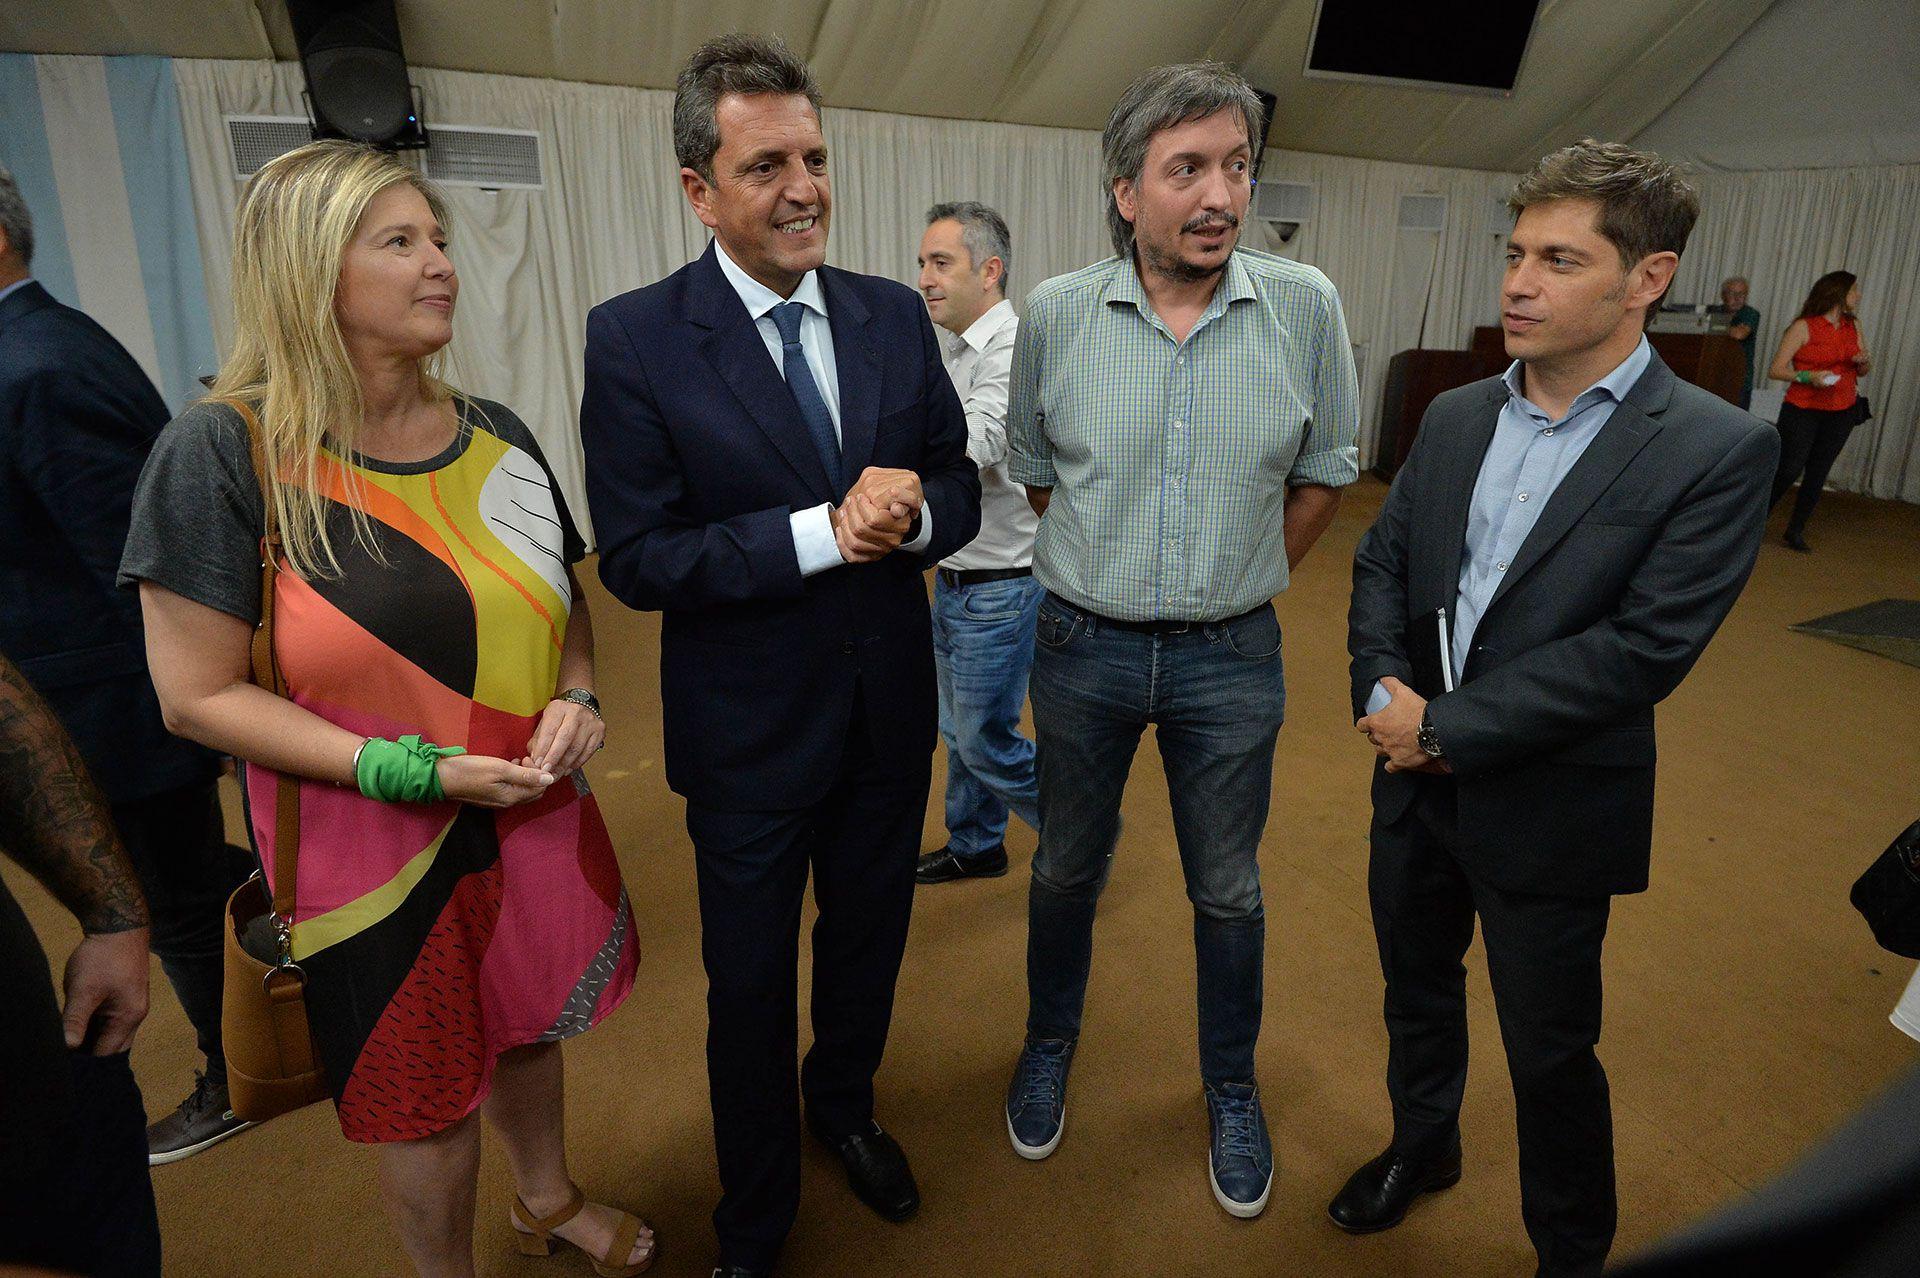 Cristina Alvarez Rodríguez, Sergio Massa, Máximo Kirchner y Axel Kicillof